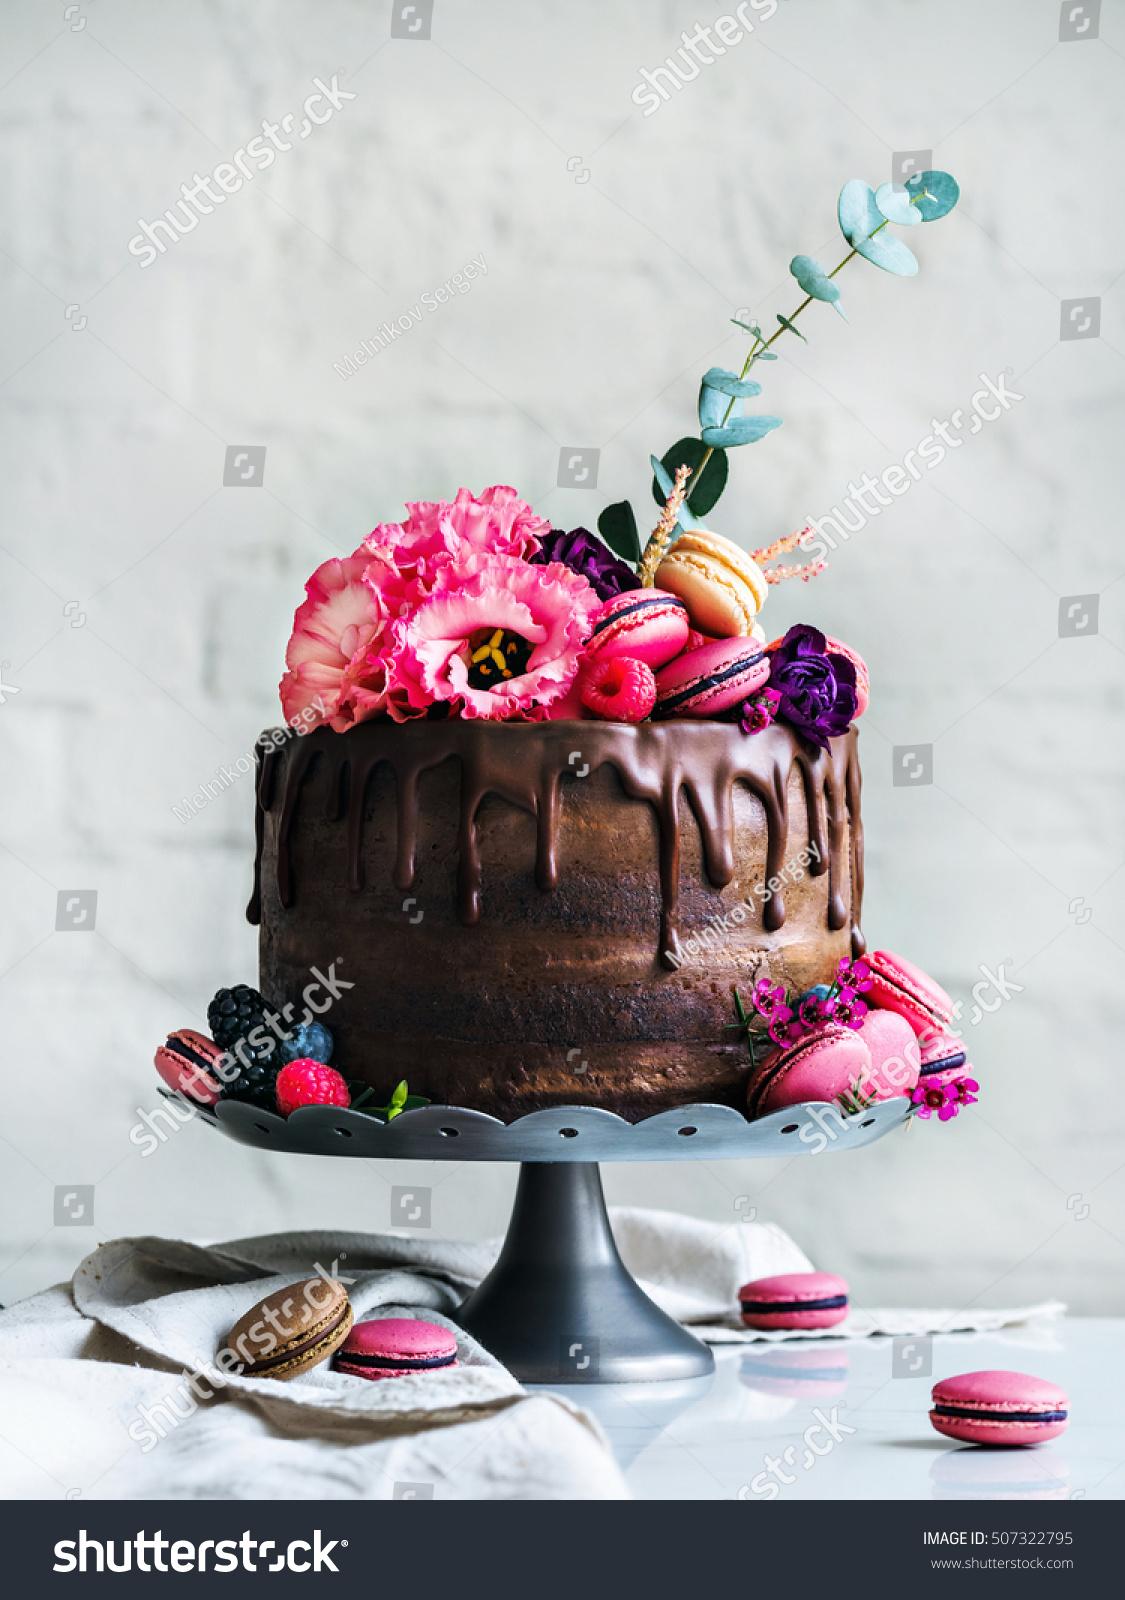 Chocolate Wedding Cake Flowers Macarons Blueberries Stock Photo